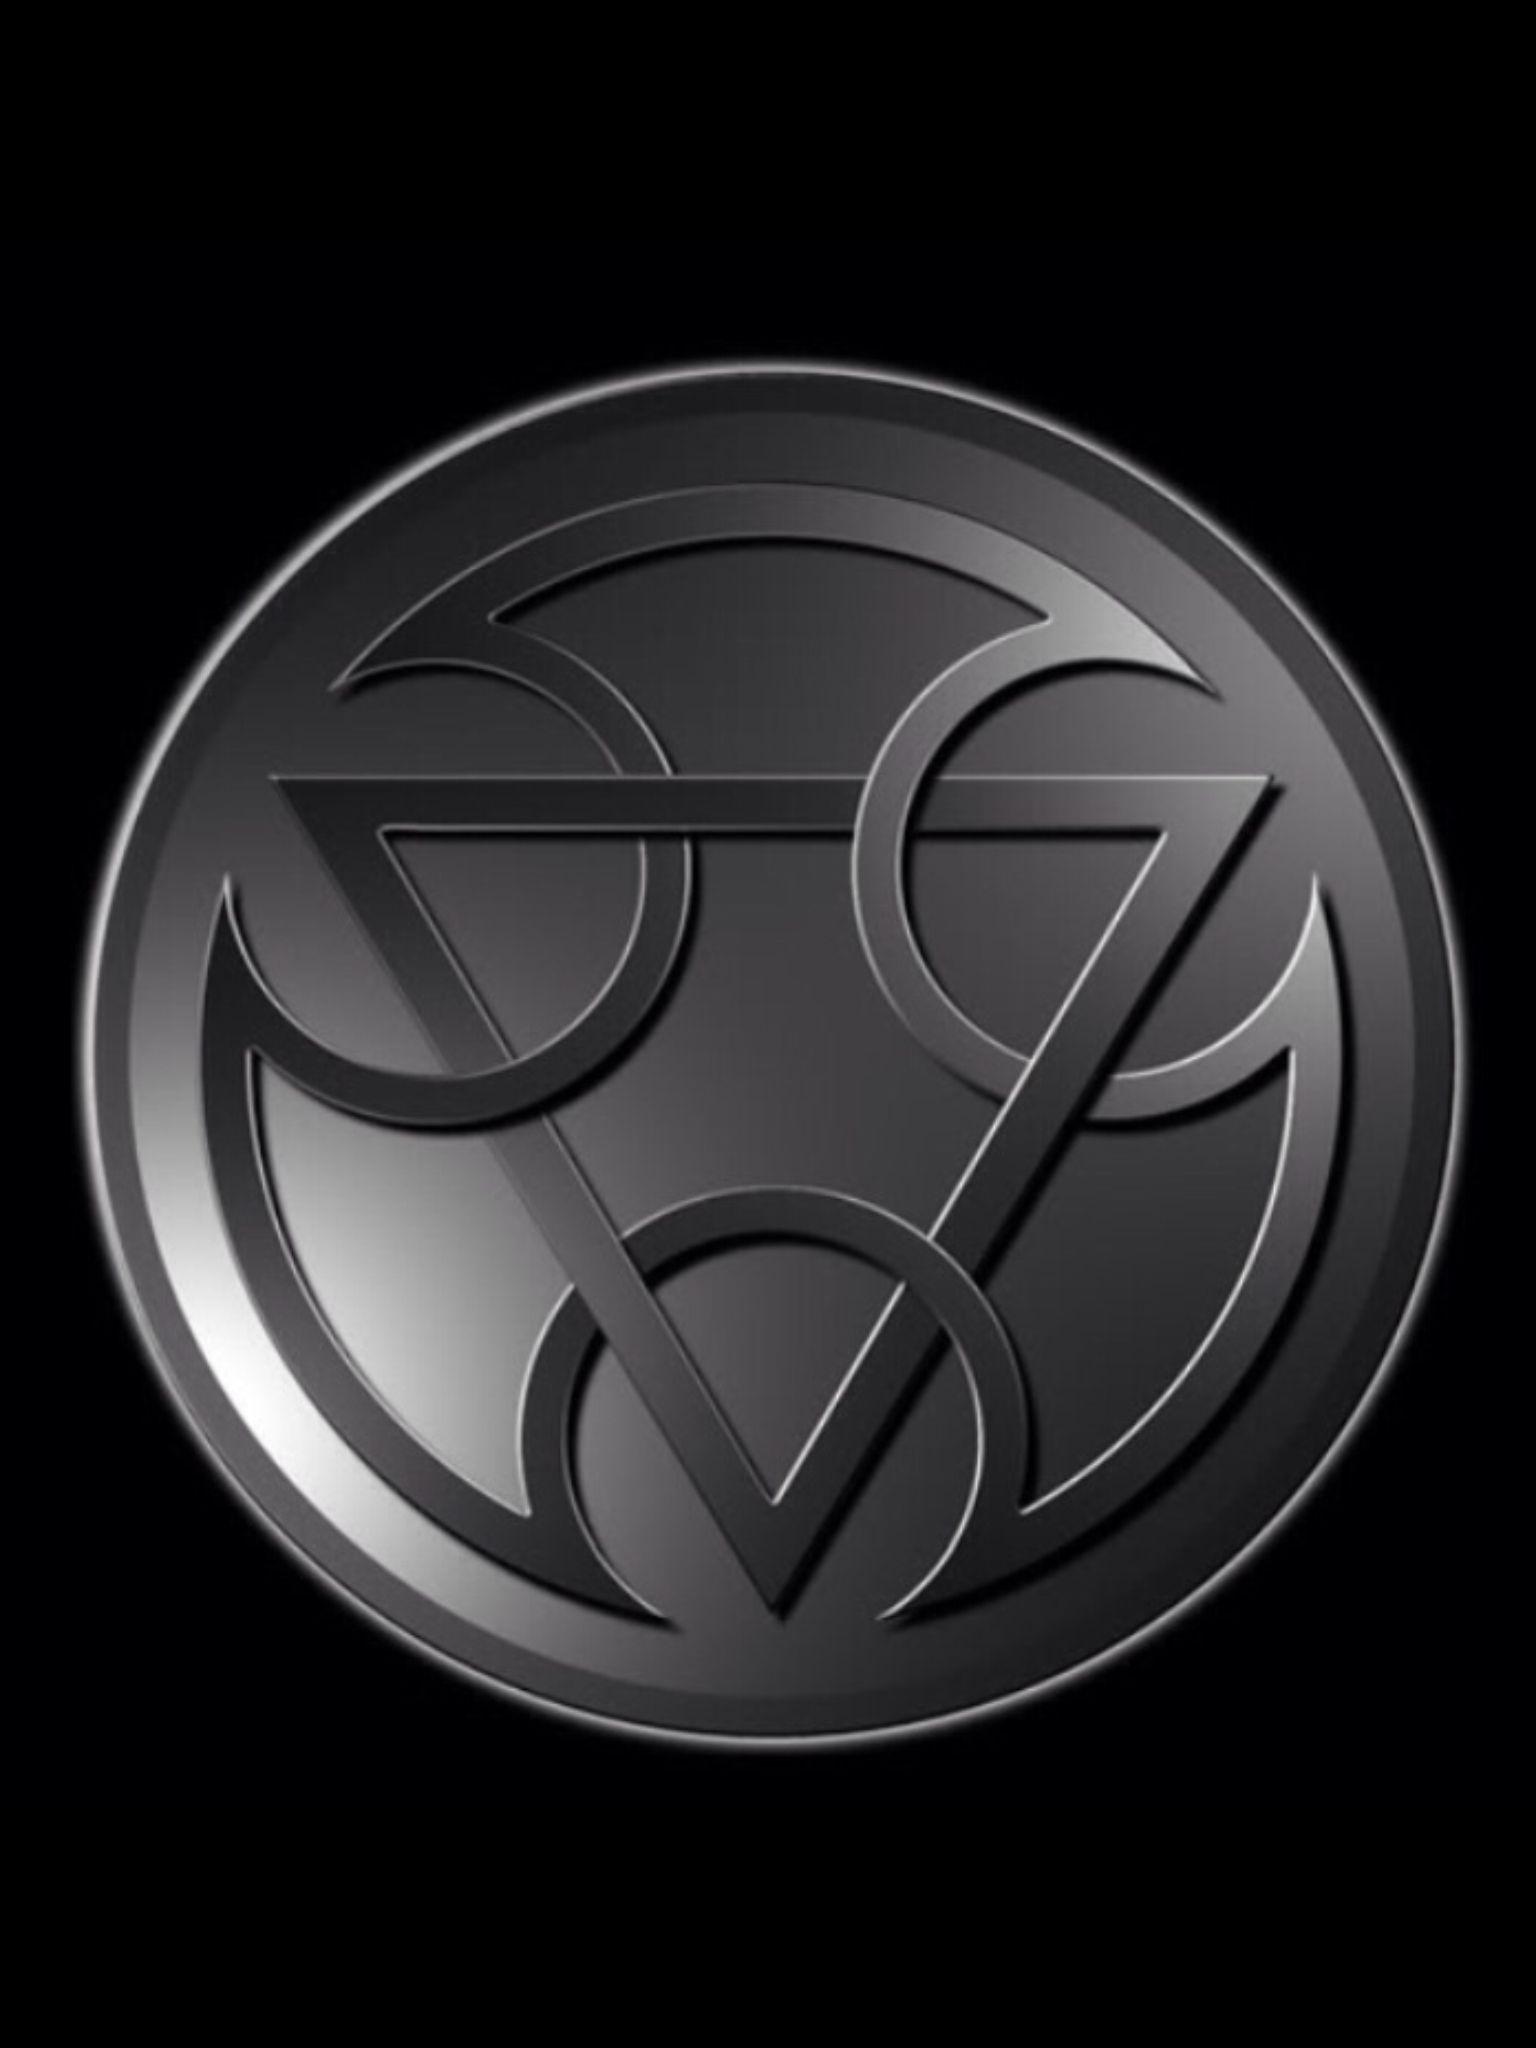 Lin Kuei Symbol Mortal kombat, Fantasy warrior, King of